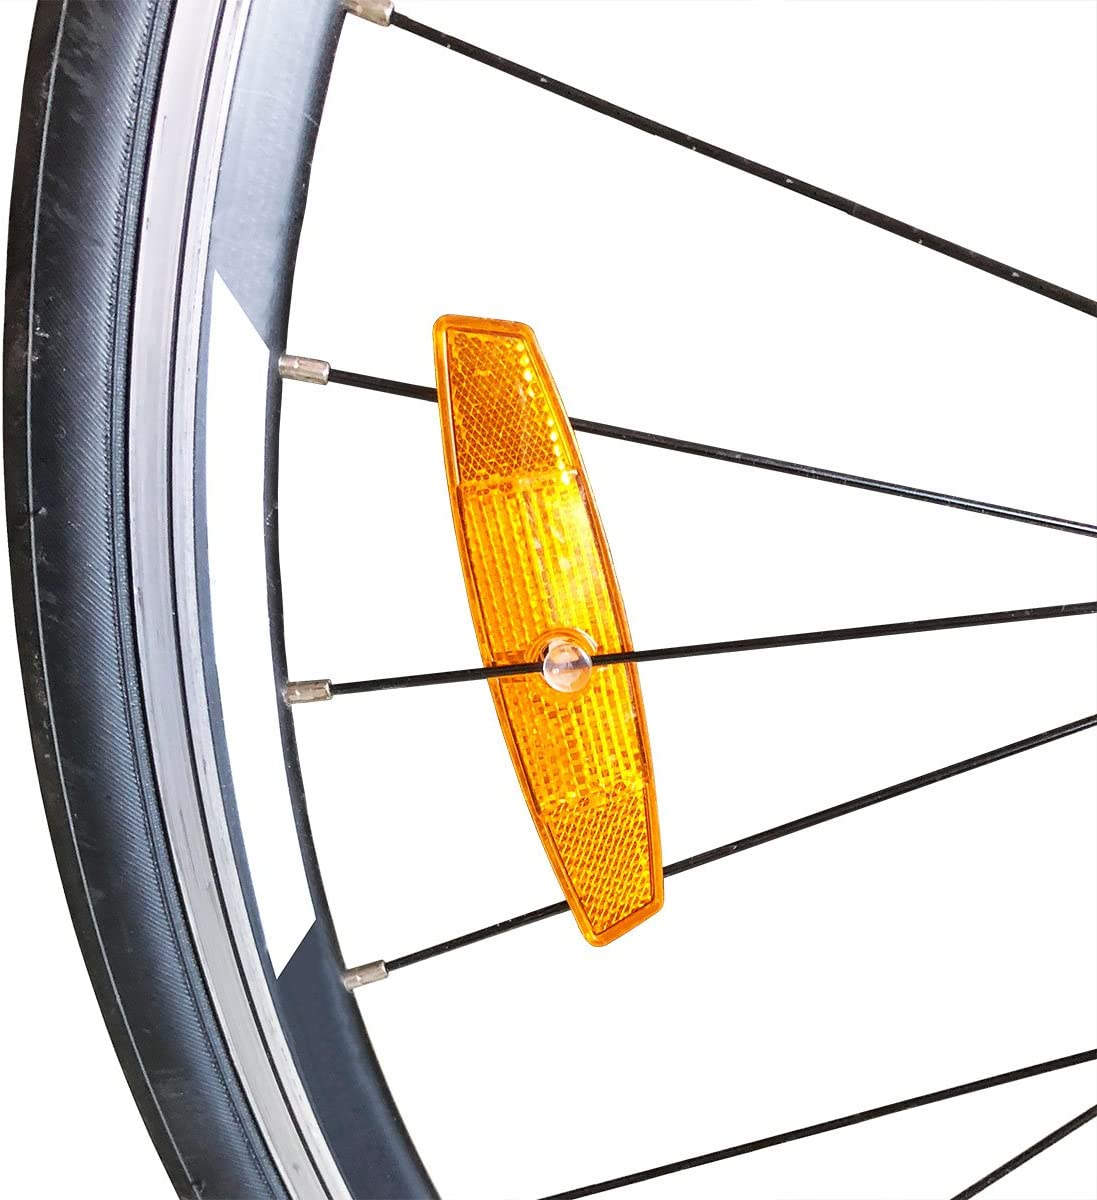 Labewin 1Pair Riding Bike Bicycle Warning Reflector Bicycle Wheel Rim Reflective MTB Road Spoke Lights Bike Accessories